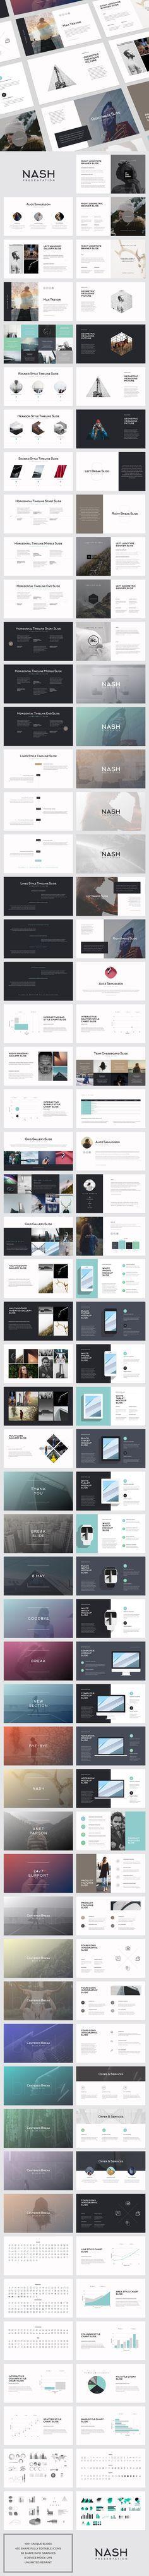 NASH Keynote Presentation: Minimal template design for Keynote. - Keynote - Ideas of Keynote - NASH Keynote Presentation: Minimal template design for Keynote. Web Design, Slide Design, Book Design, Layout Design, Print Design, Modern Design, Design Presentation, Presentation Templates, Presentation Slides